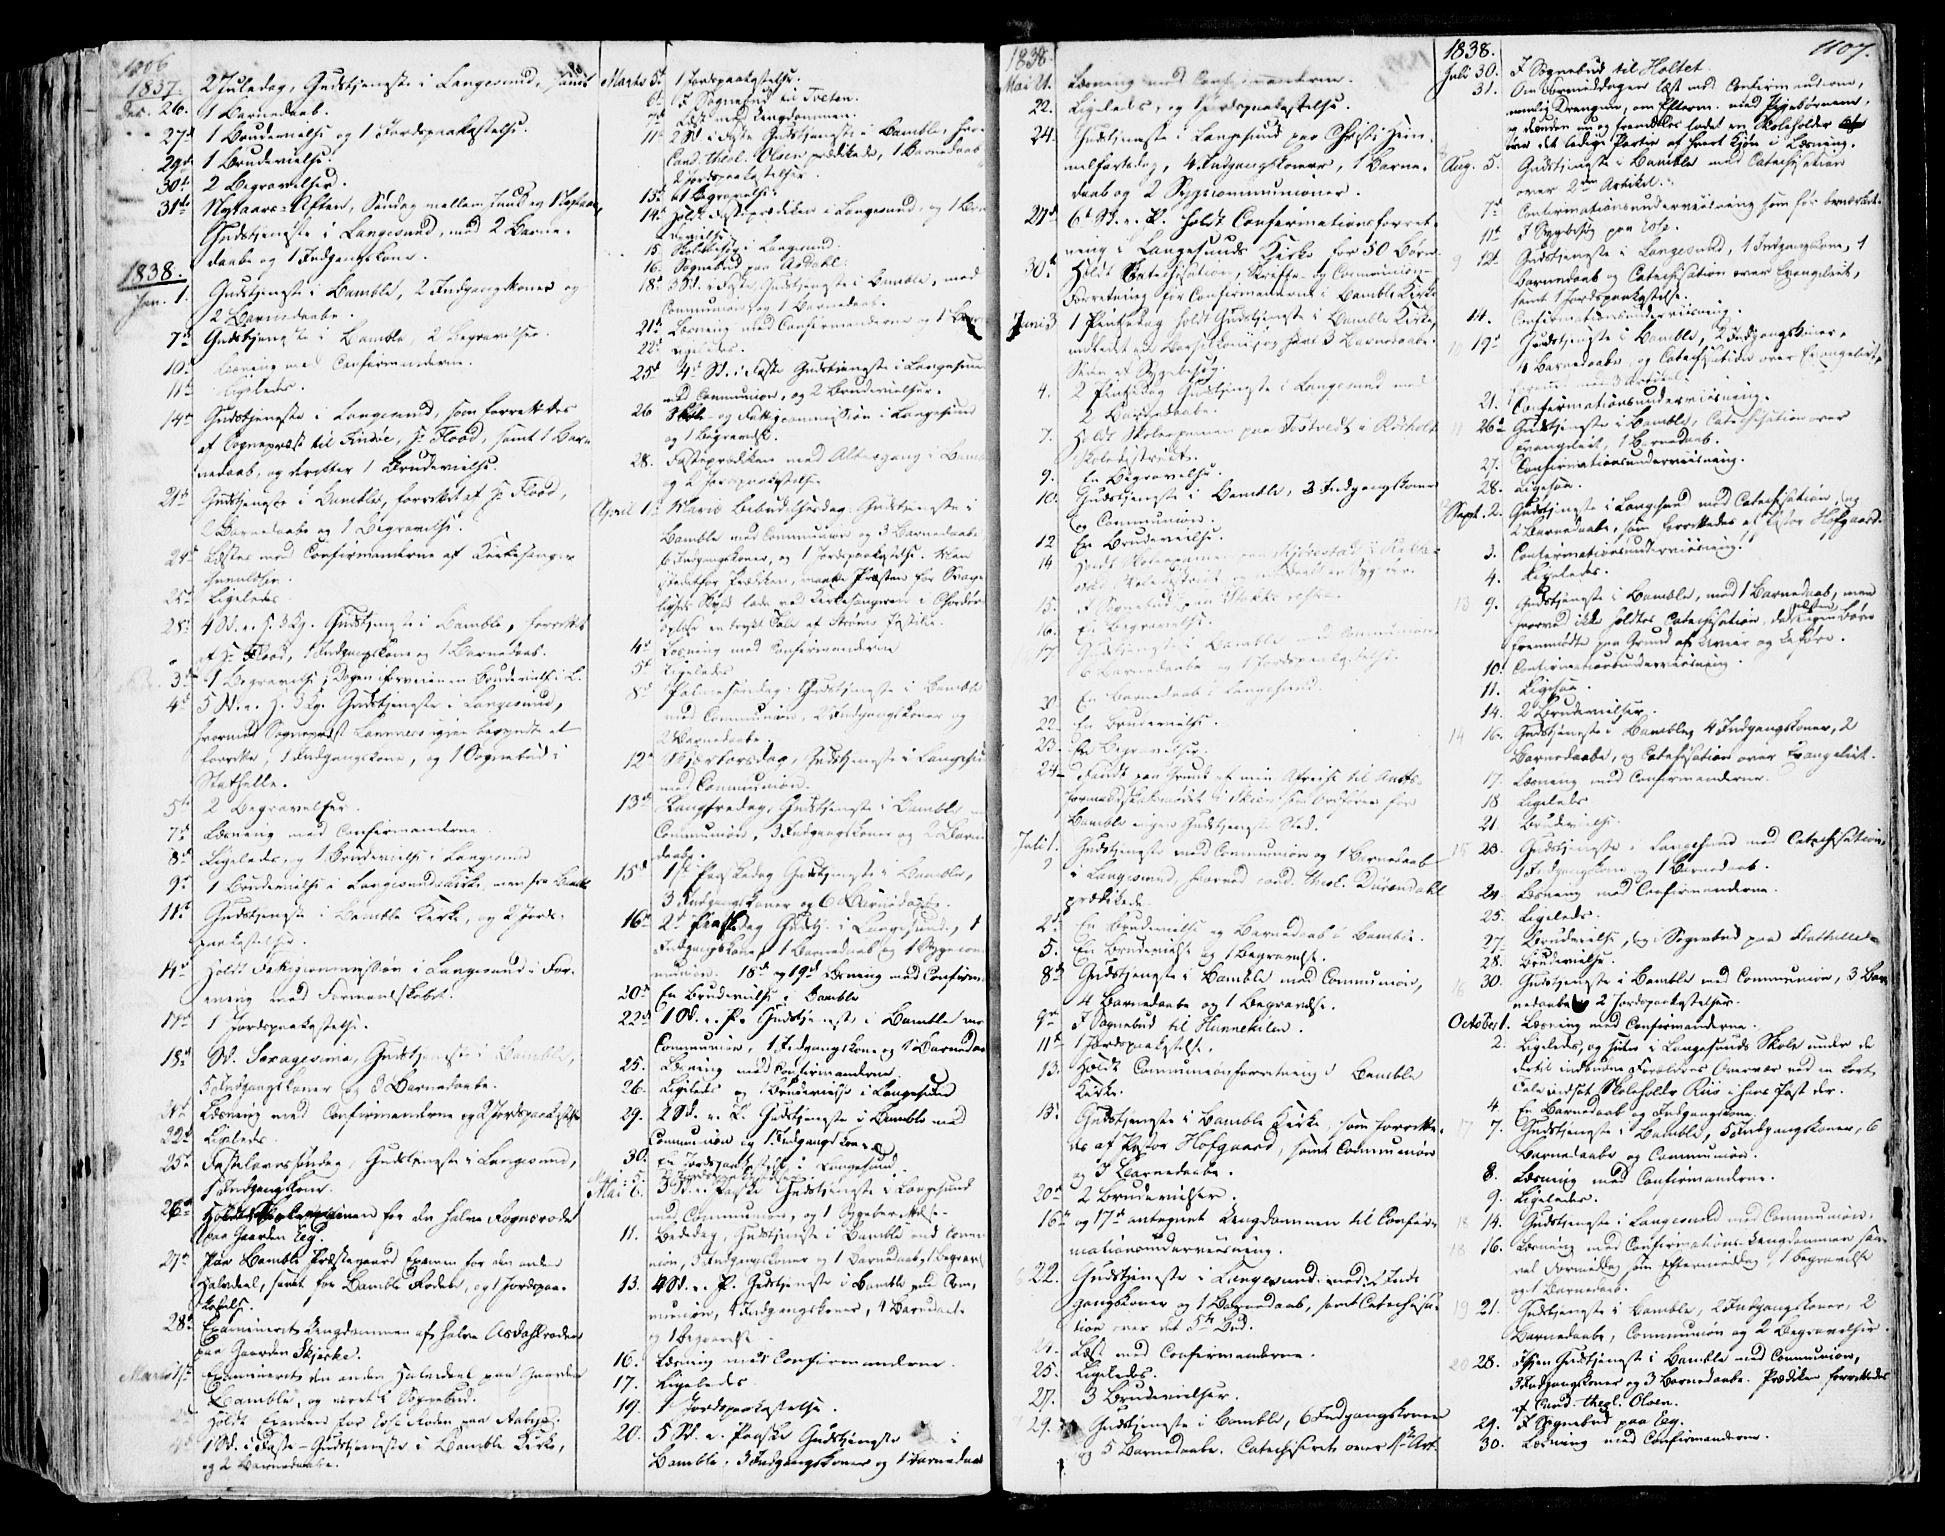 SAKO, Bamble kirkebøker, F/Fa/L0004: Ministerialbok nr. I 4, 1834-1853, s. 1106-1107